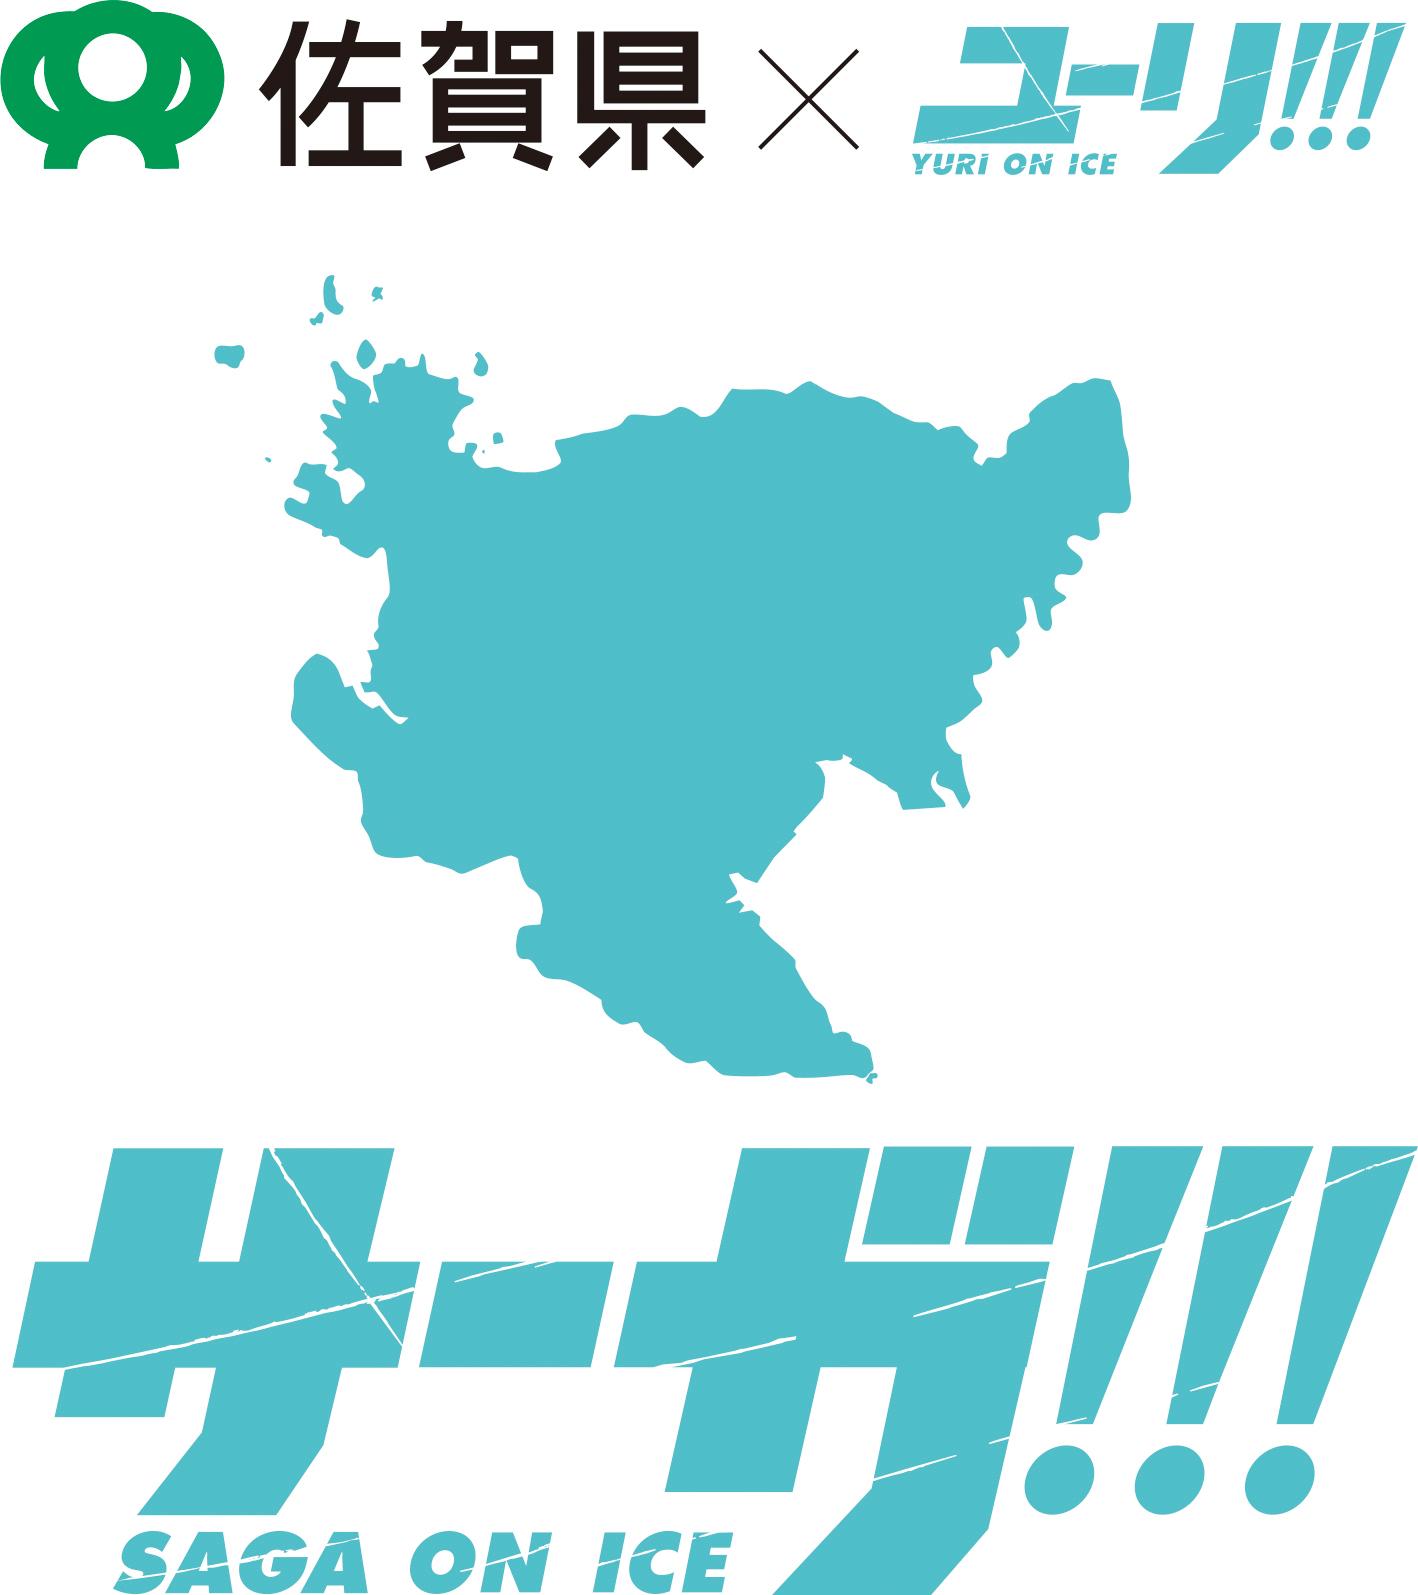 佐賀県×『ユーリ!!! on ICE』「サーガ!!! on ICE 」開催!